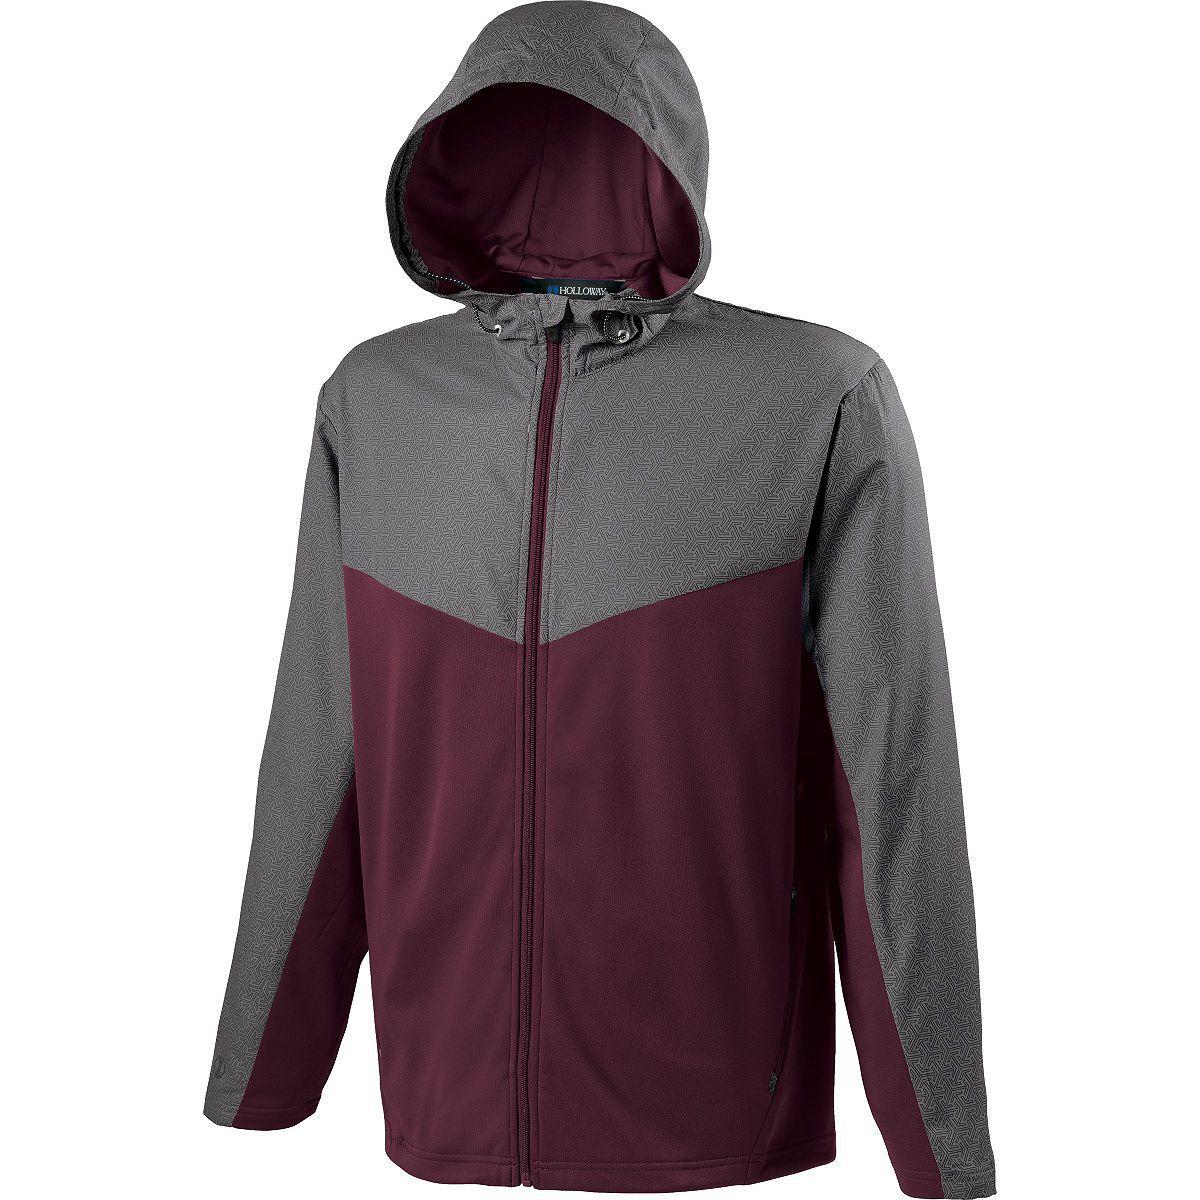 Adult Crossover Jacket - GREY PRINT/MAROON